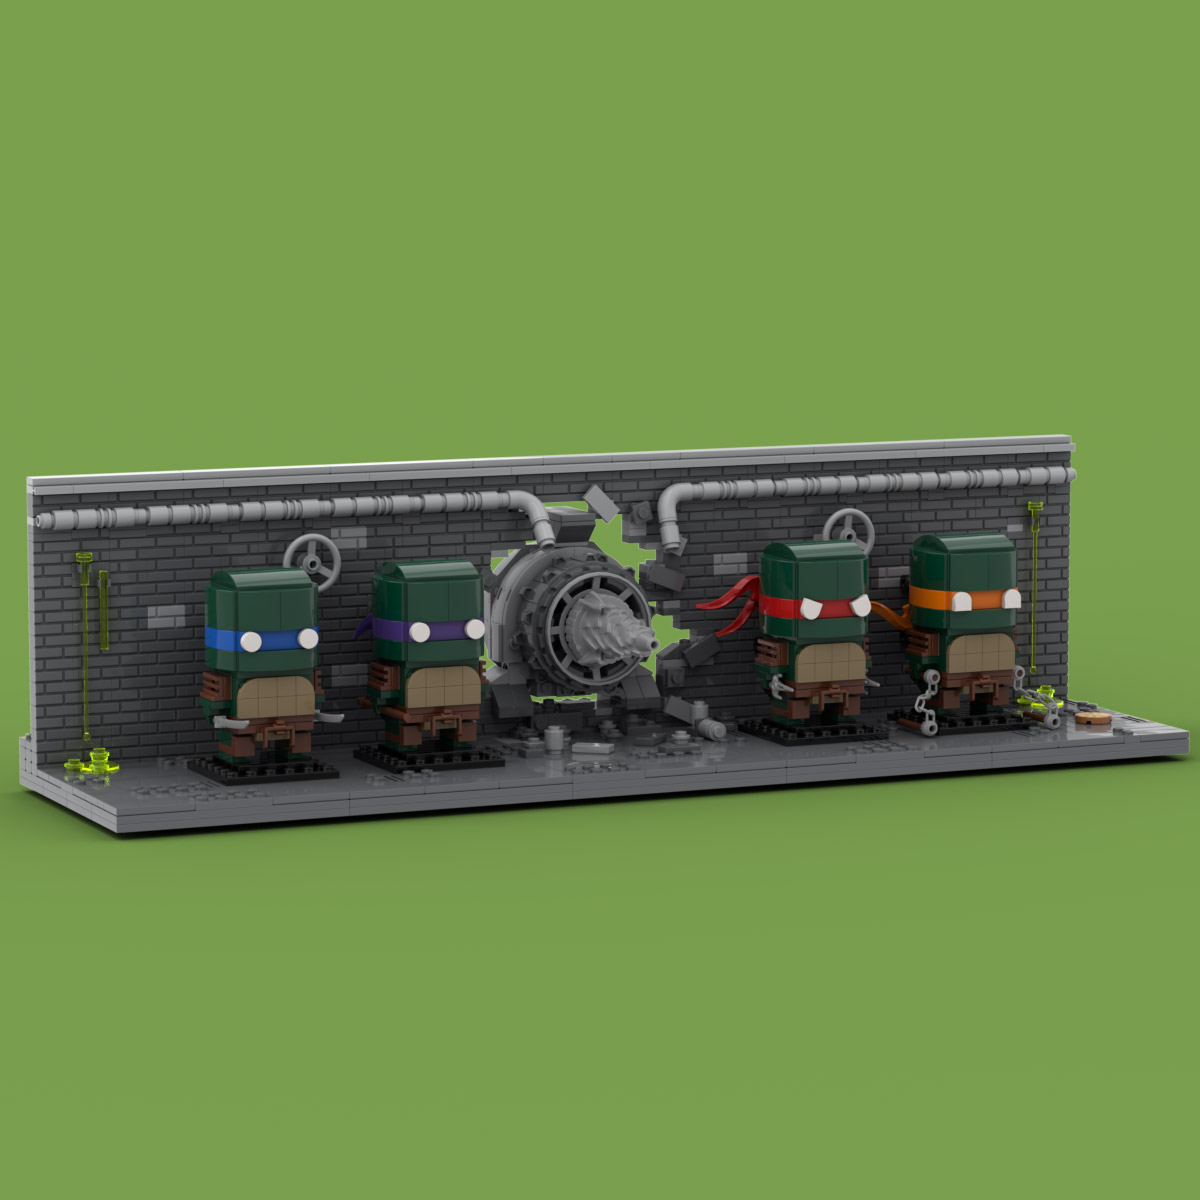 PDF INSTRUCTIONS ONLY Lego Ninja Turtles Brickheadz Display Stand Custom MOC